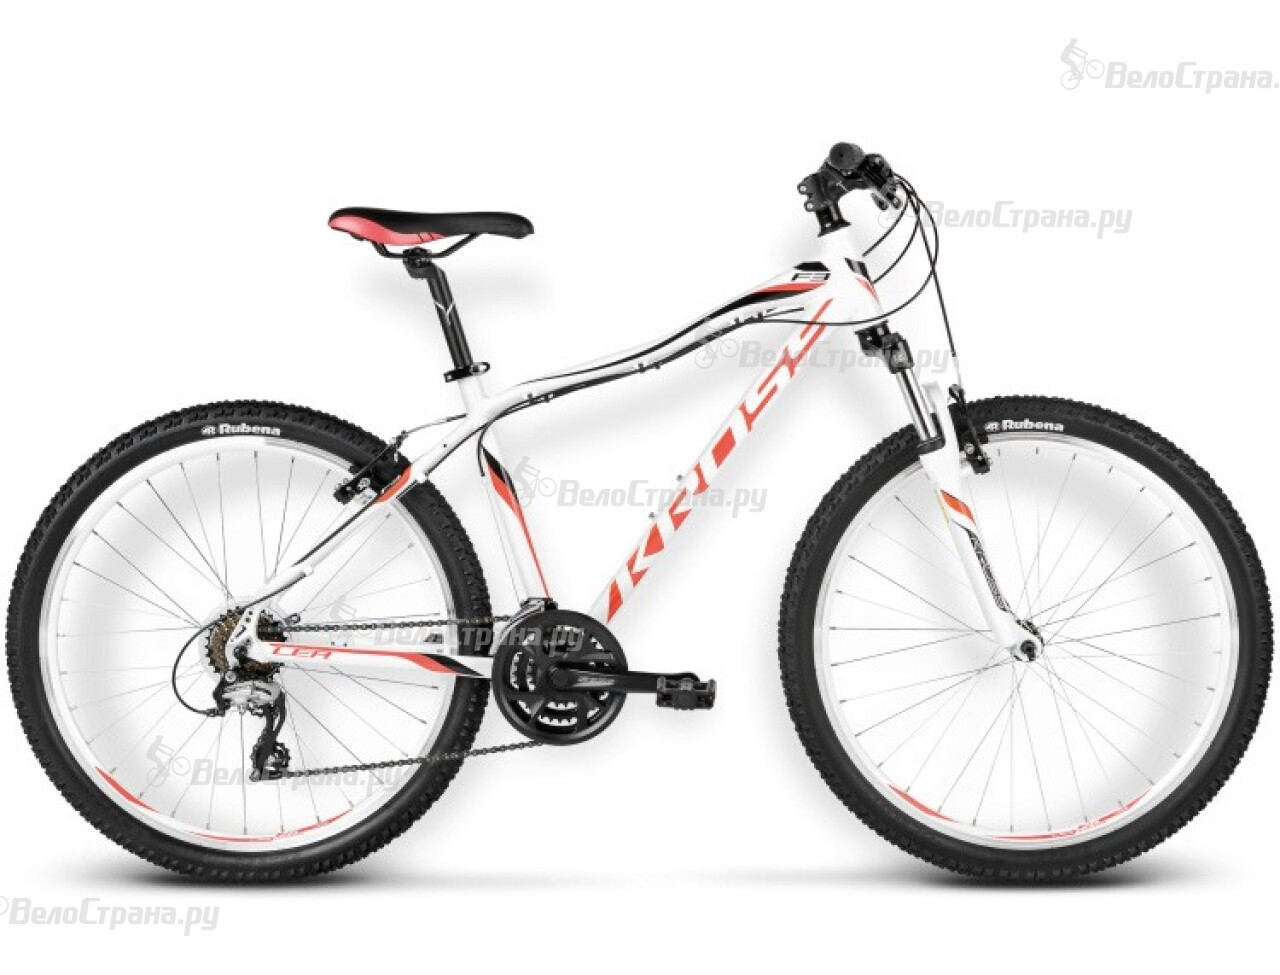 Велосипед Kross Lea F3 (2016) велосипед kross lea f4 2016